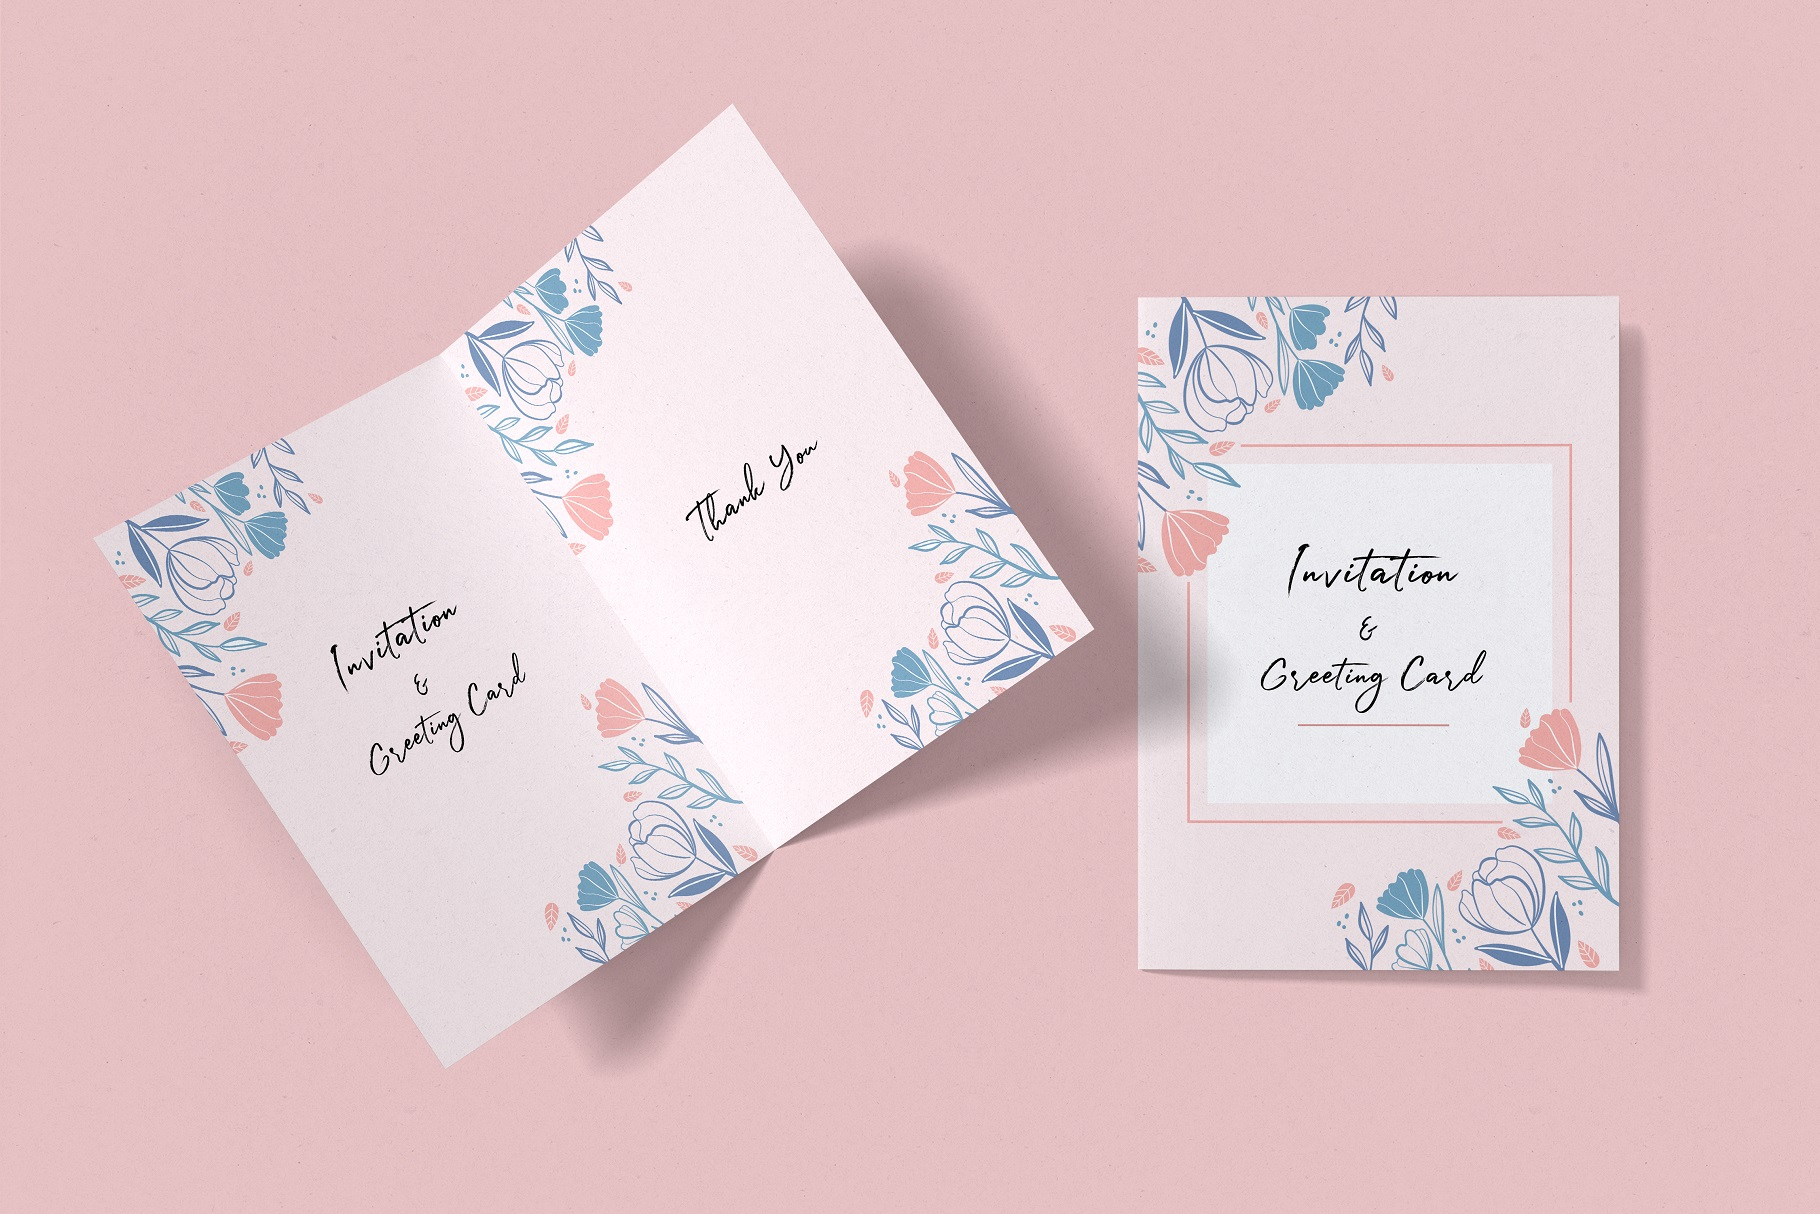 Invitation & Greeting Card Mockup example image 11